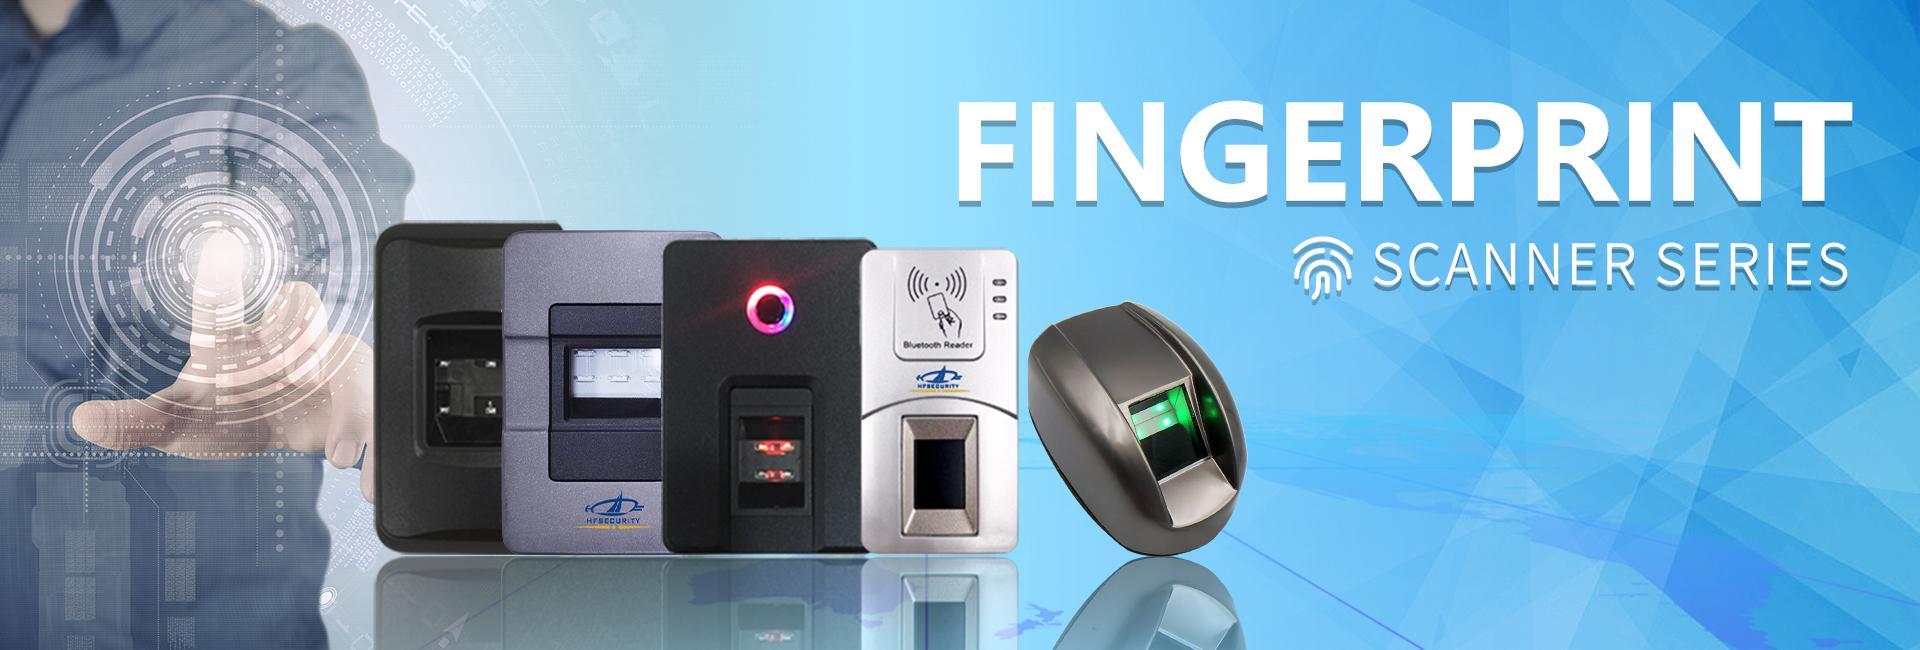 HFSecurity Biometric Fingerprint Scanner Device